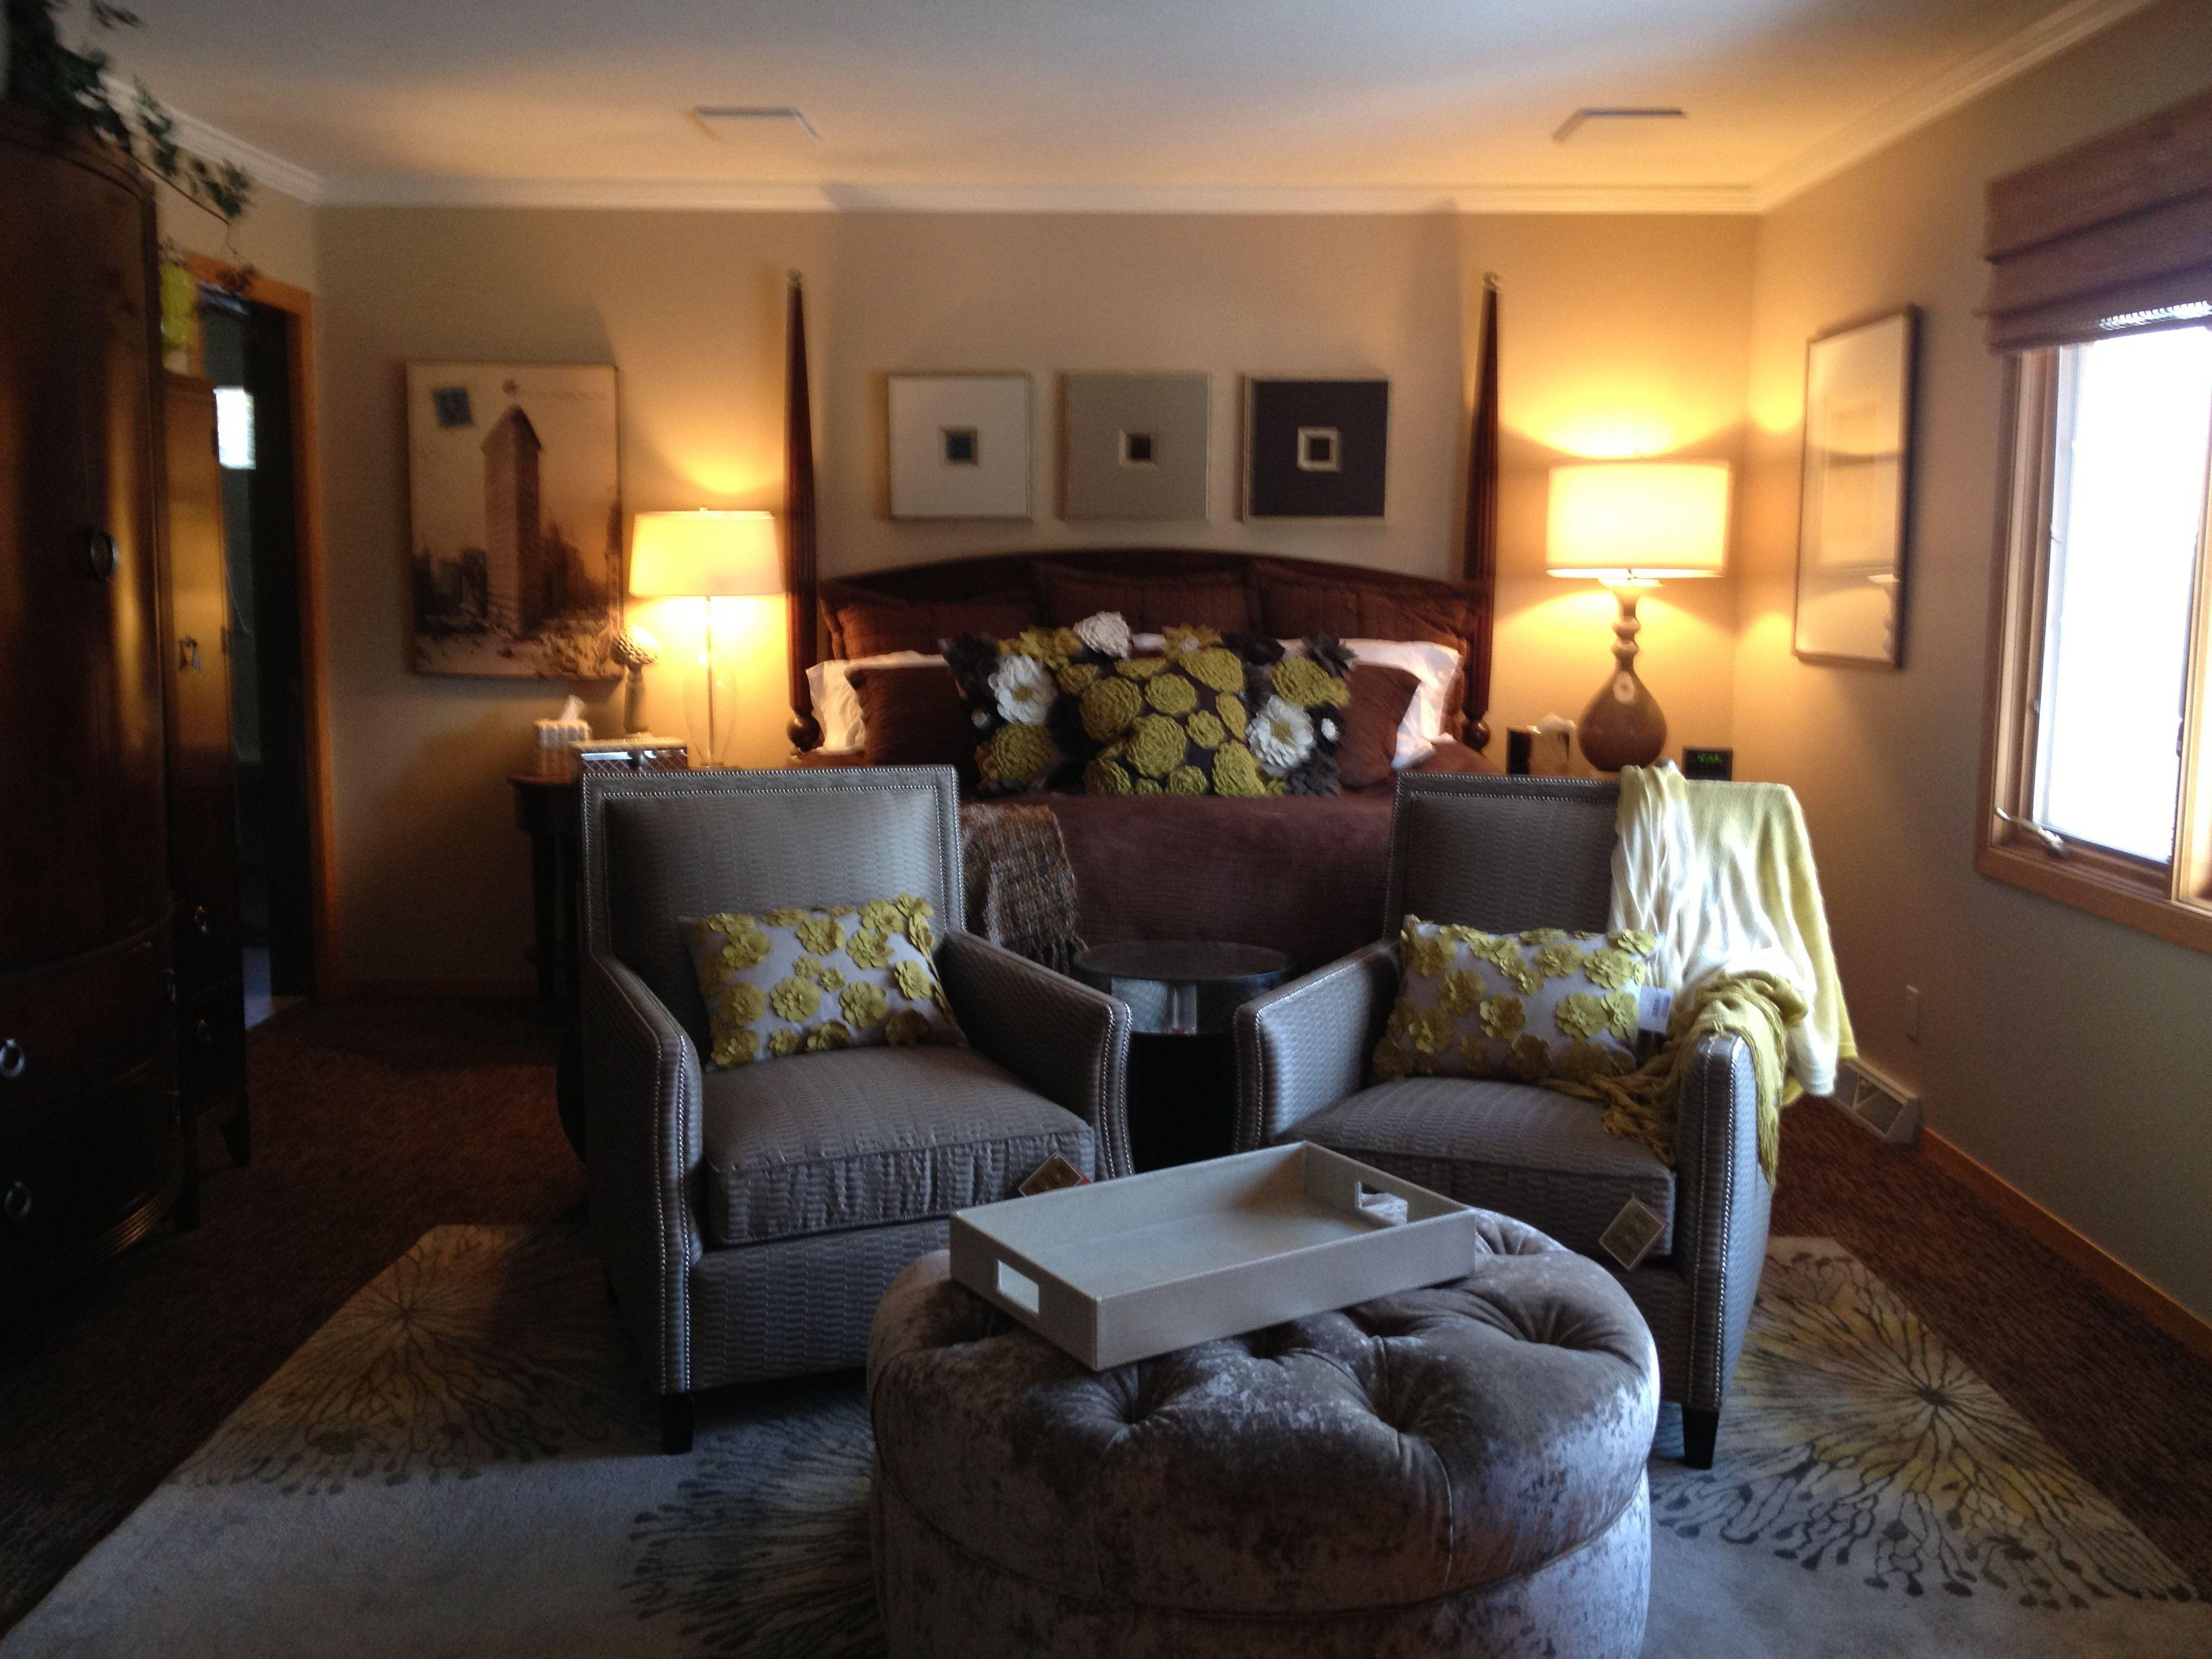 Master Bedroom sitting area | Master Bedroom | Pinterest